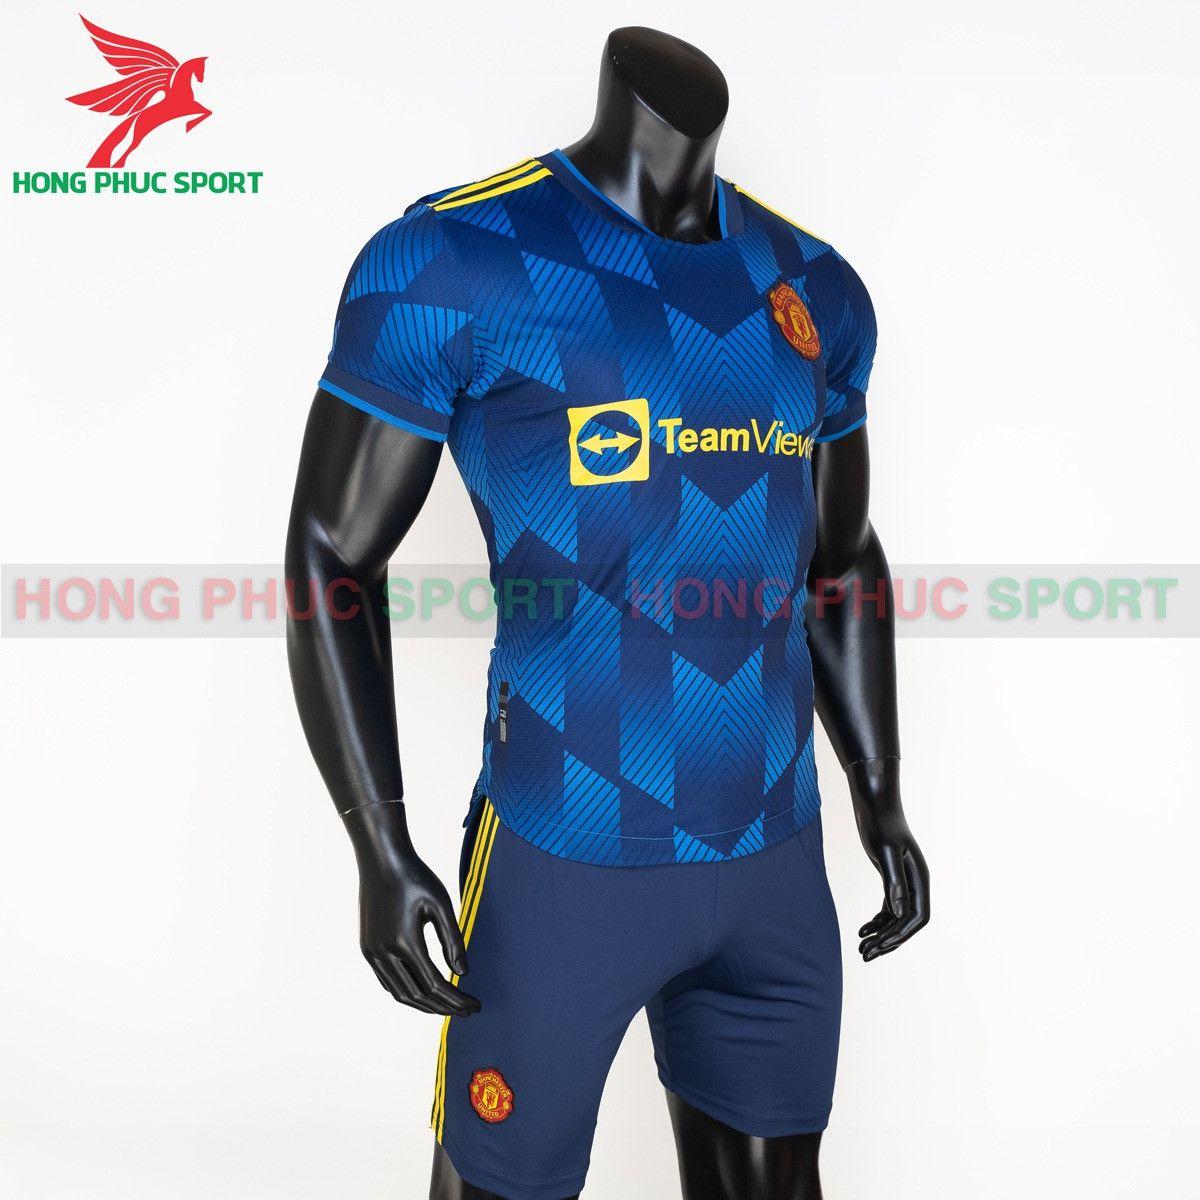 https://cdn.hongphucsport.com/unsafe/s4.shopbay.vn/files/285/ao-dau-manchester-united-2021-2022-mau-thu-3-thailand-3-6149b0d5e8b27.jpg